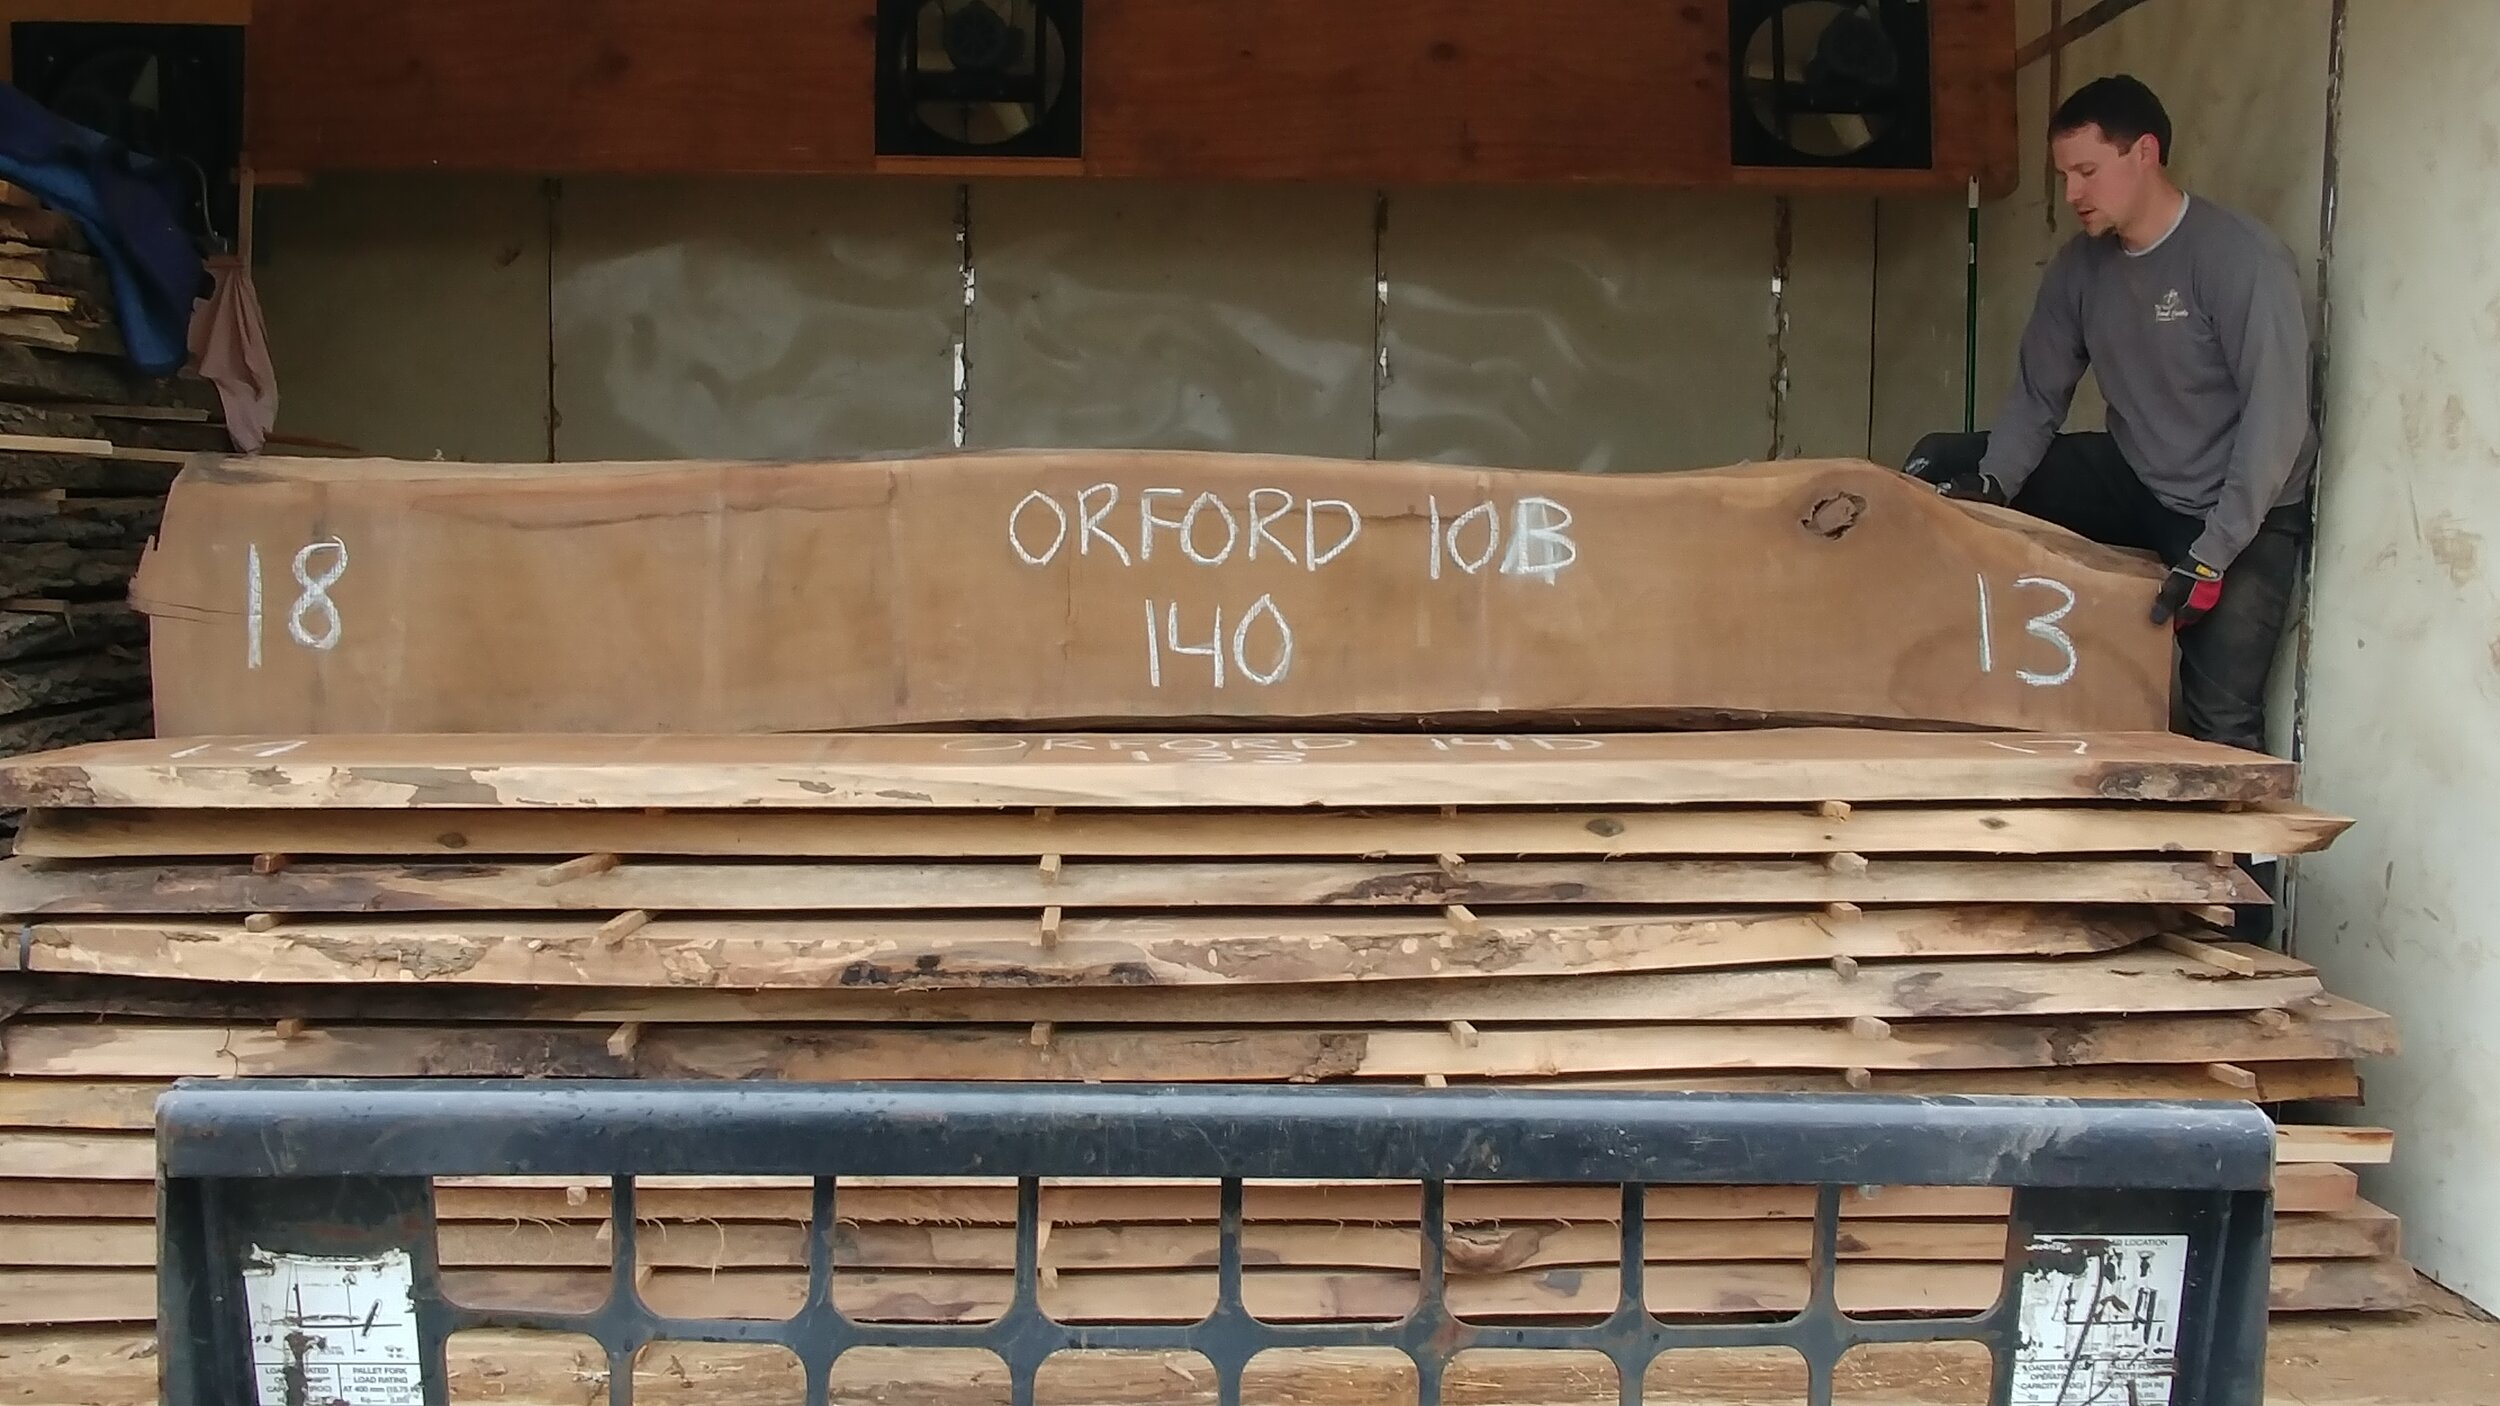 Orford 10B.jpg